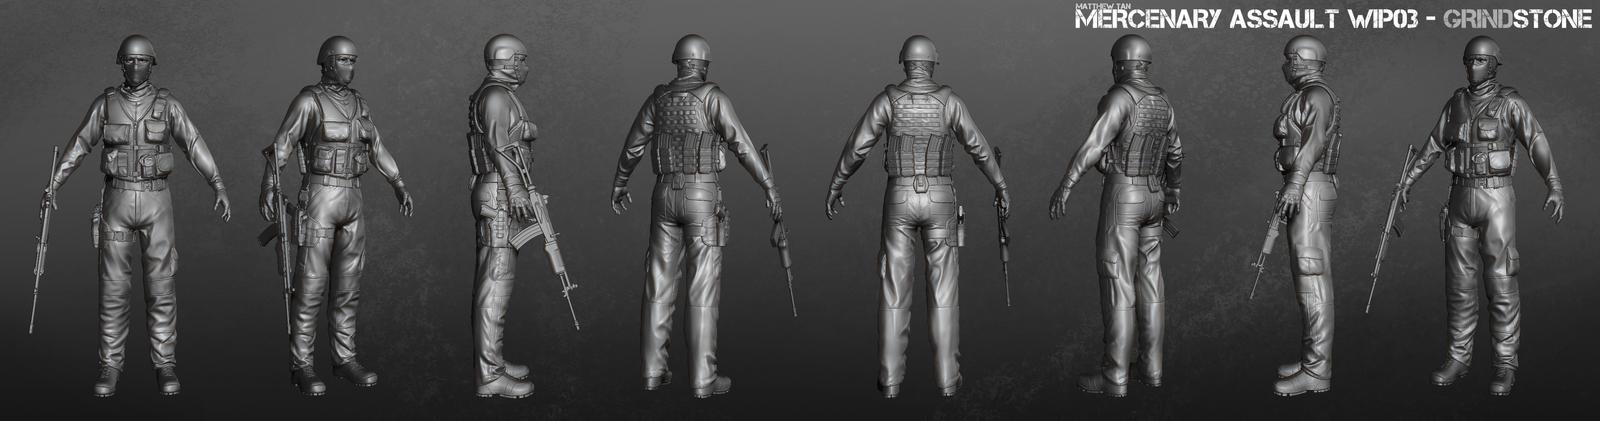 Mercenary Assault Grindstone by Lapislazulix